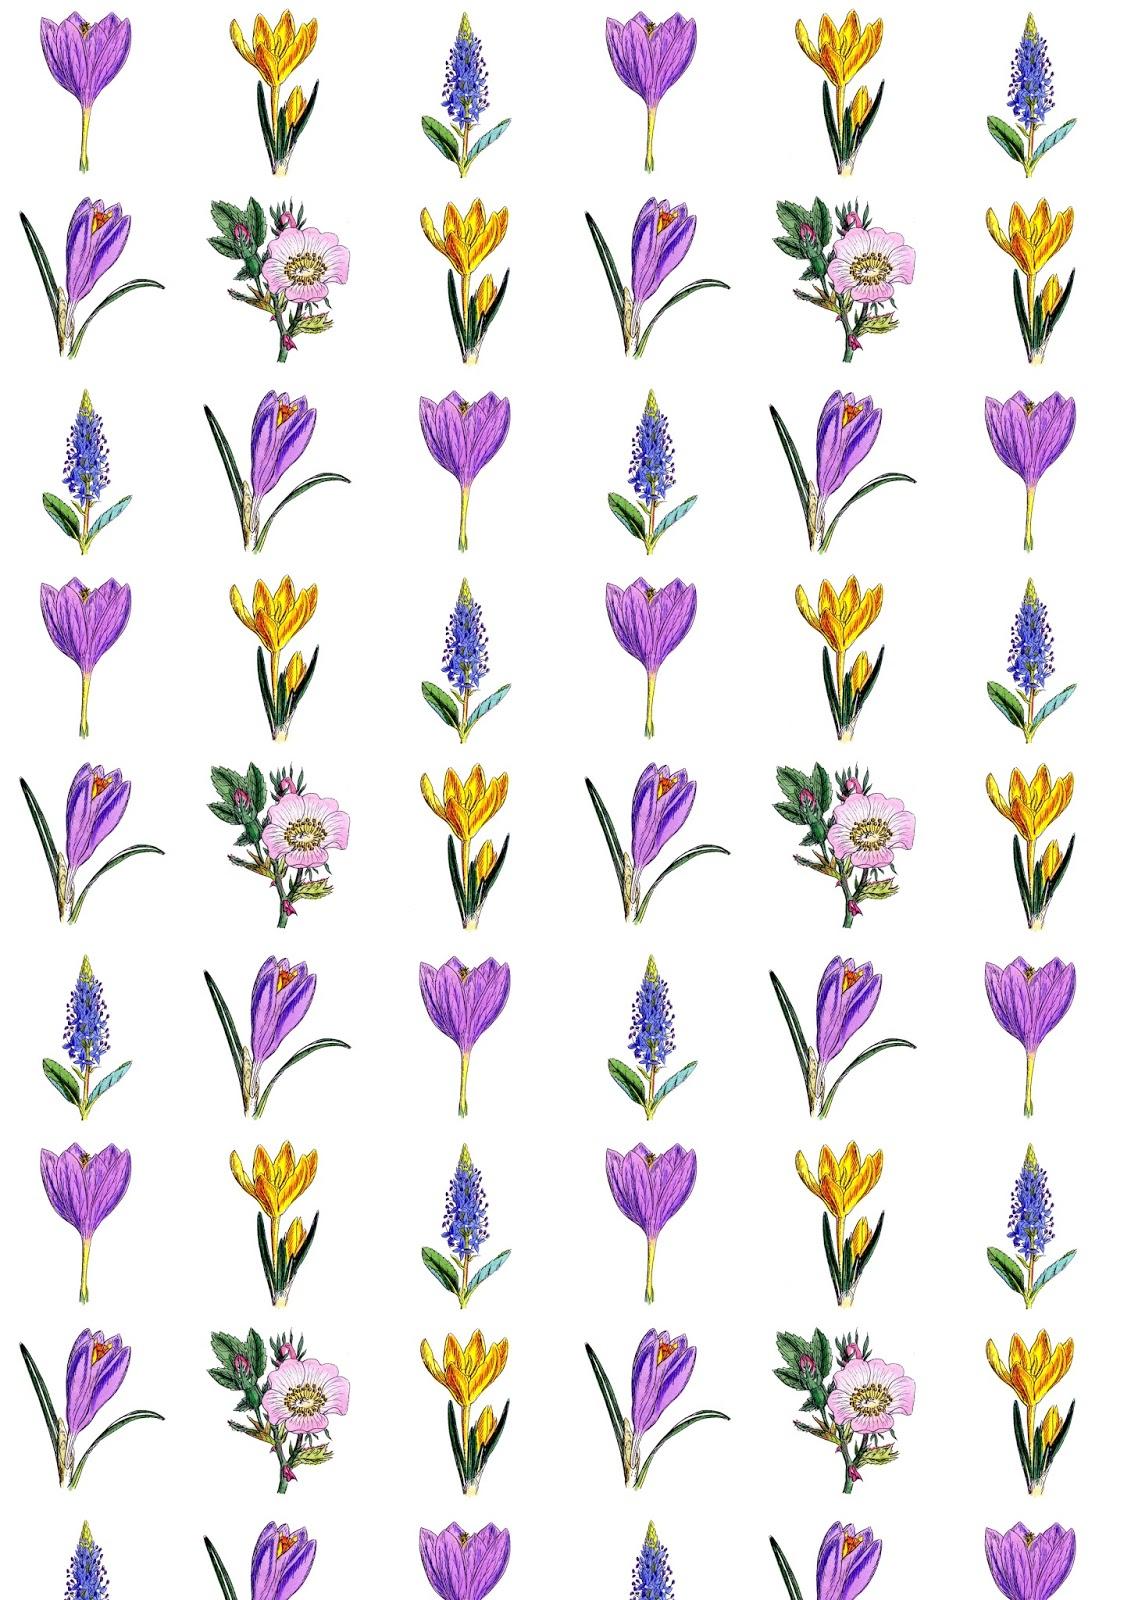 http://2.bp.blogspot.com/-YR-h4obtX60/VQM5o6ayFpI/AAAAAAAAiXY/cPiATLHa4-E/s1600/vintage_flower_paper_A4.jpg